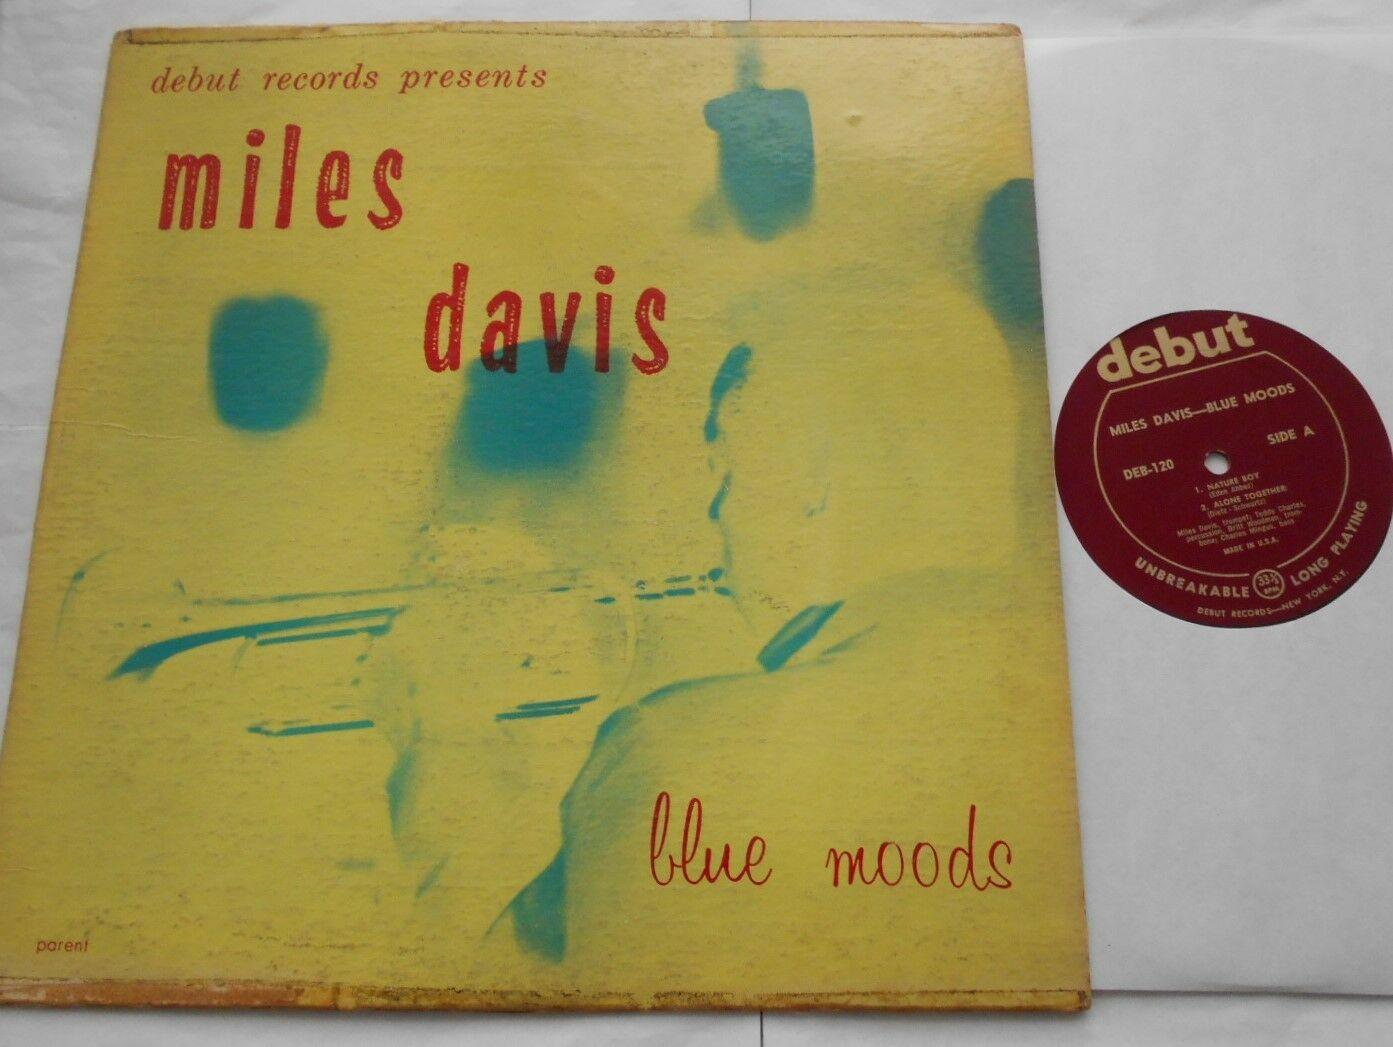 MILES DAVIS w/ CHARLES MINGUS Blue Moods ORIGINAL 1955 DEBUT DEB-120 JAZZ US LP